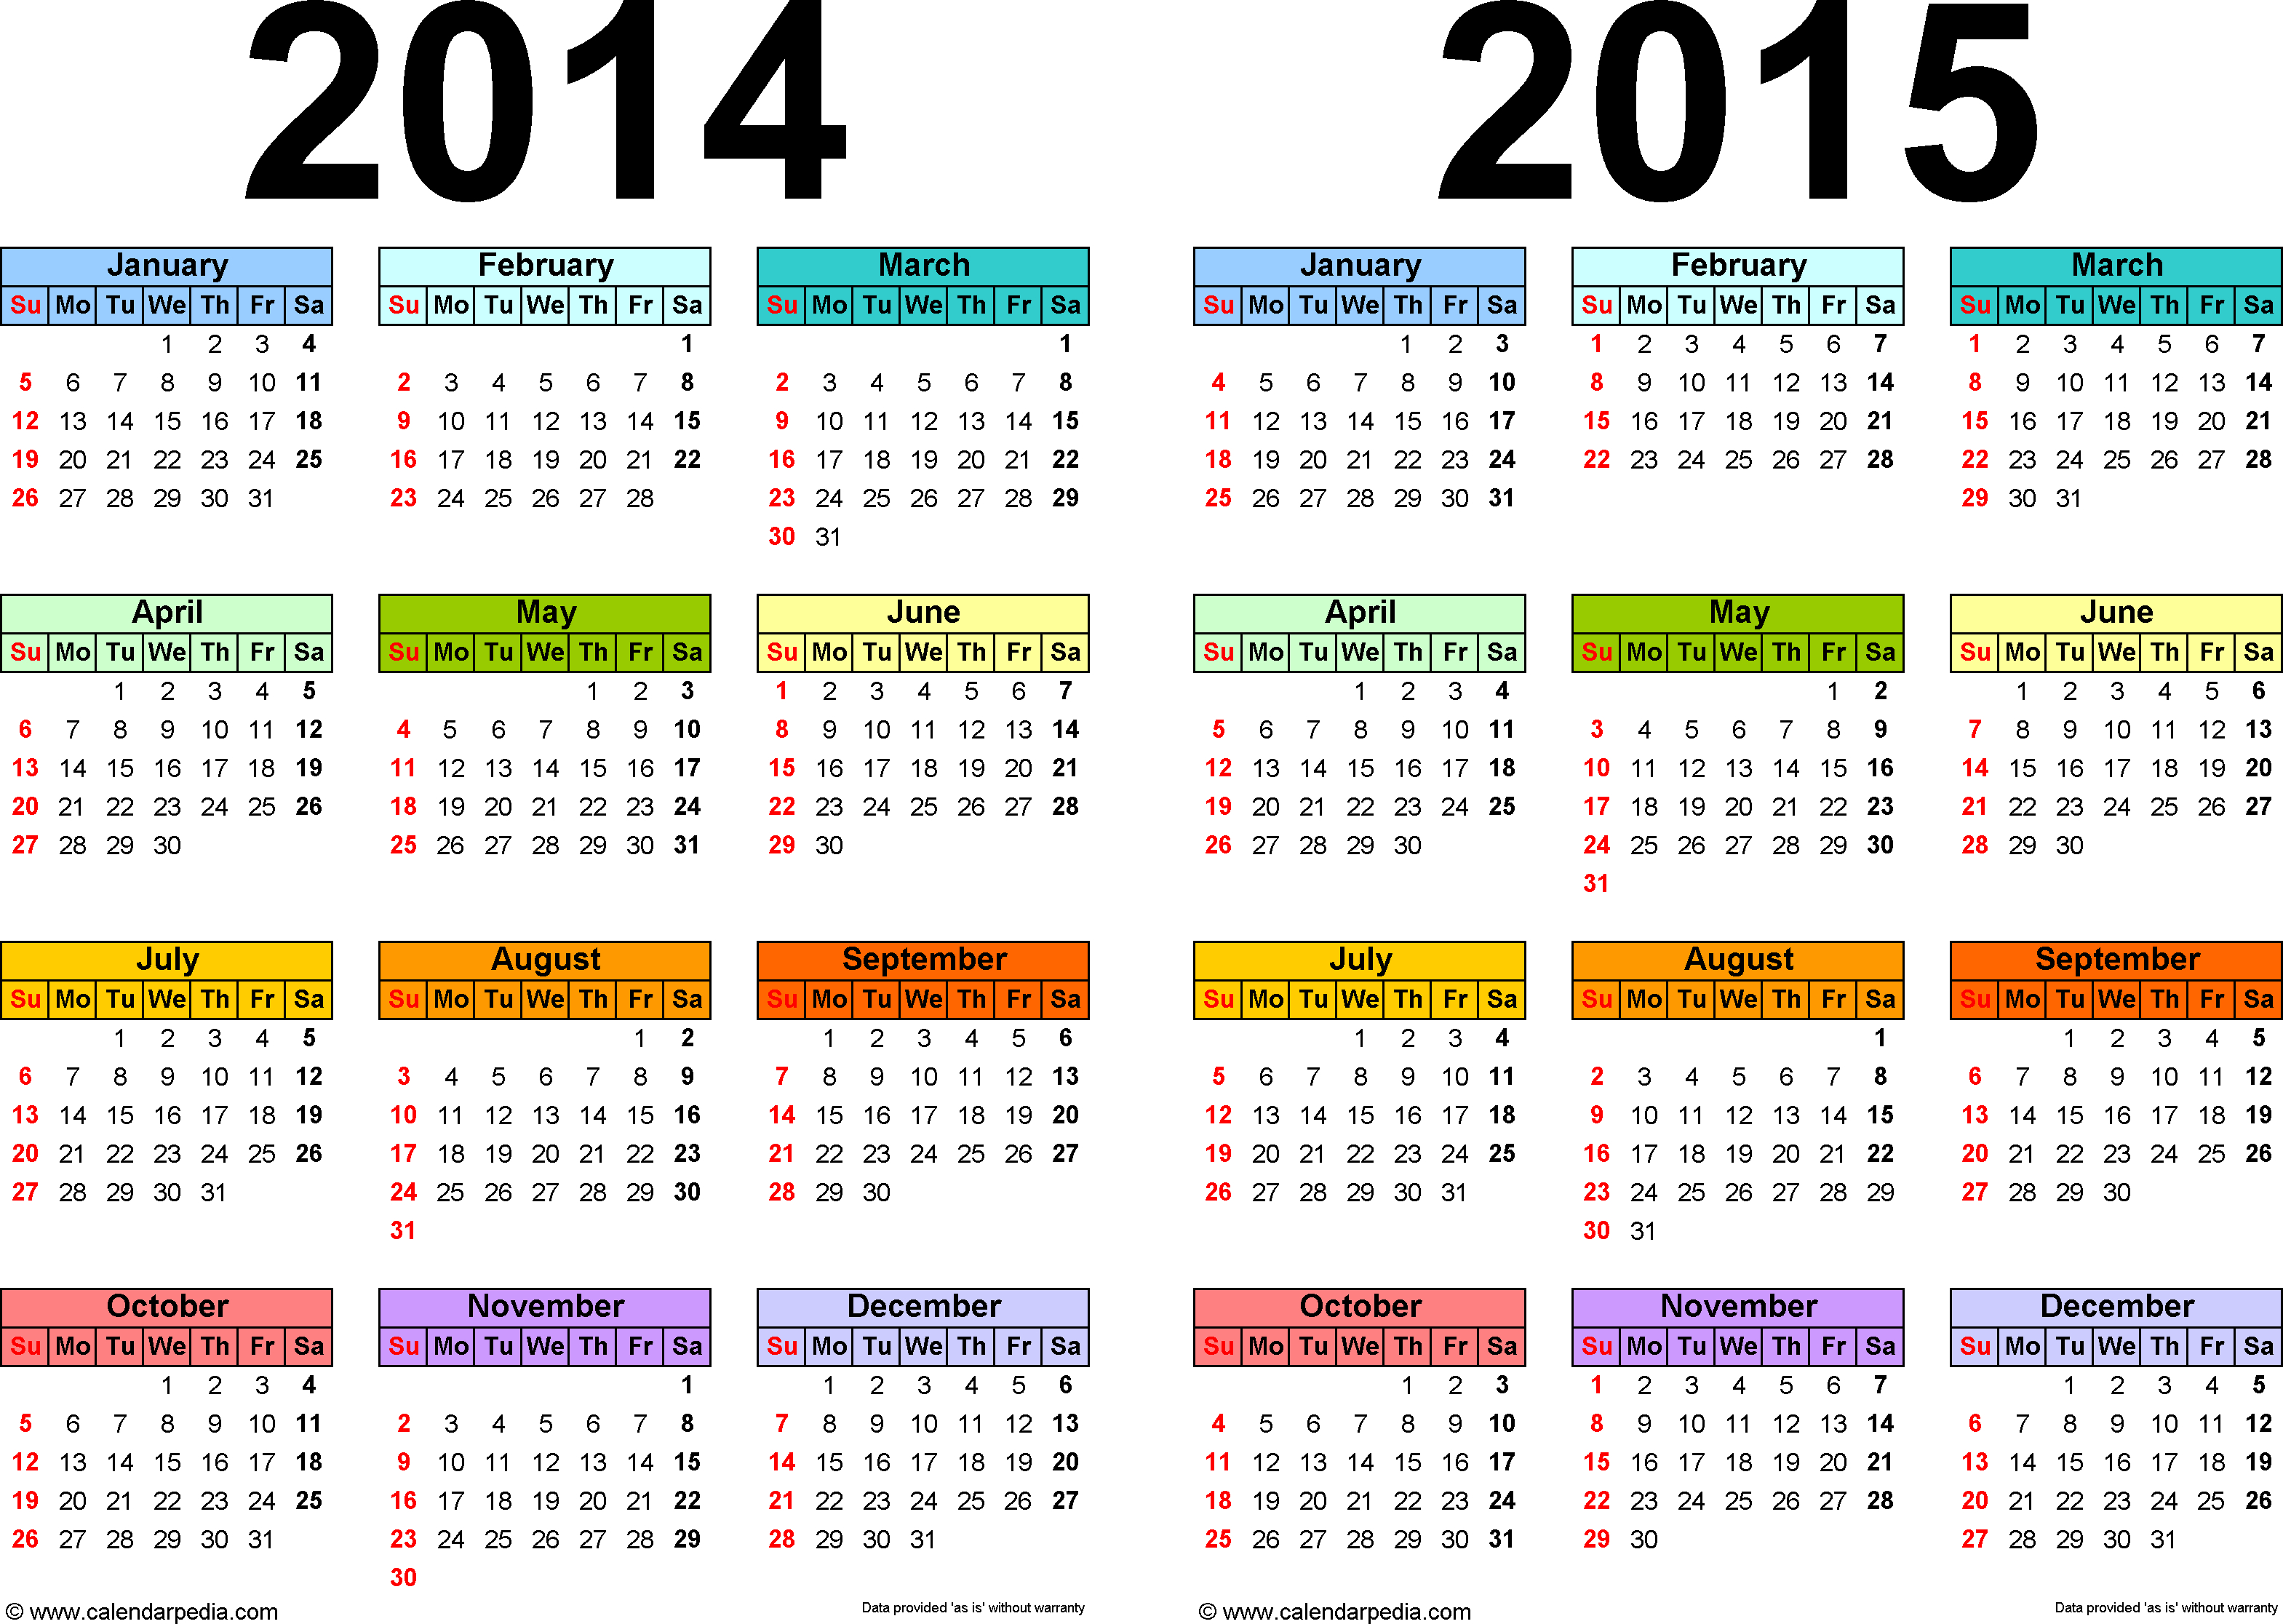 2014-2015 Calendar - Free Printable Two-Year Excel Calendars